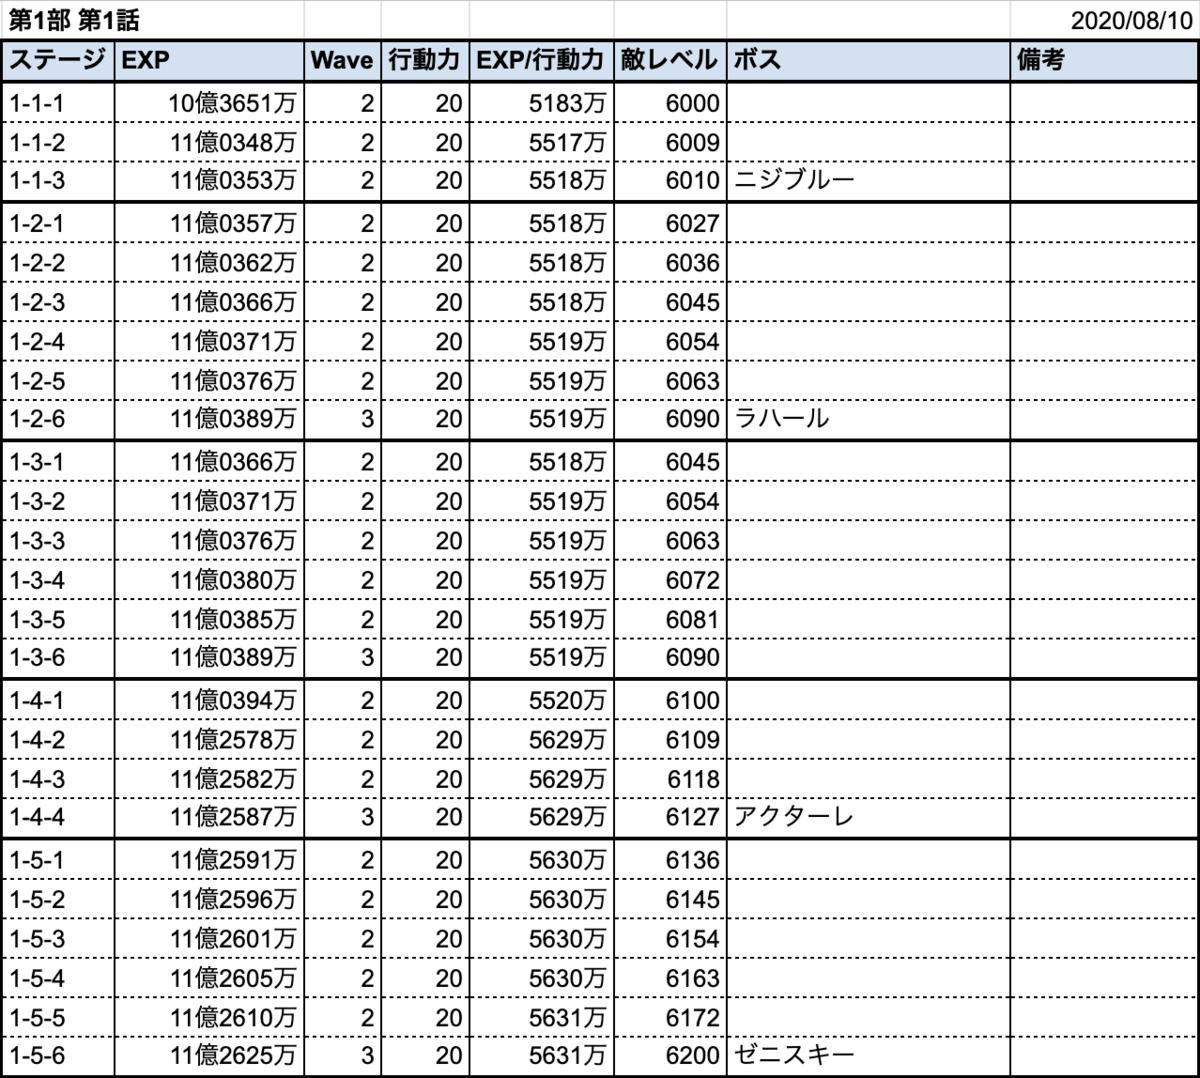 f:id:Yoshitaka-0922:20200810171640p:plain